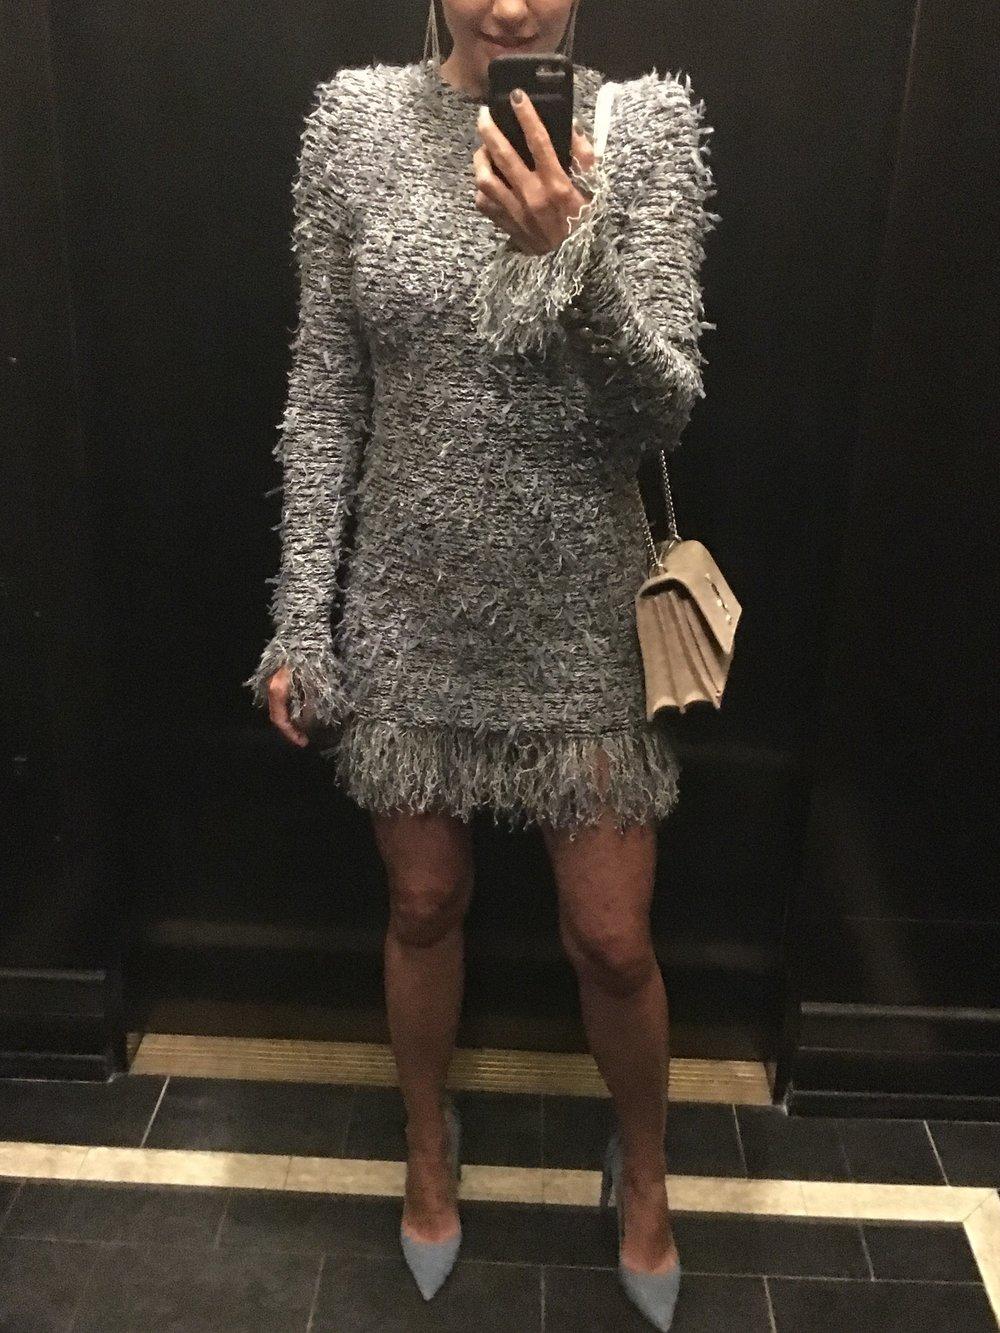 Balmain Fringe Tweed Dress, Altuzarra Suede Shoes, Saint Laurent Sunset Bag